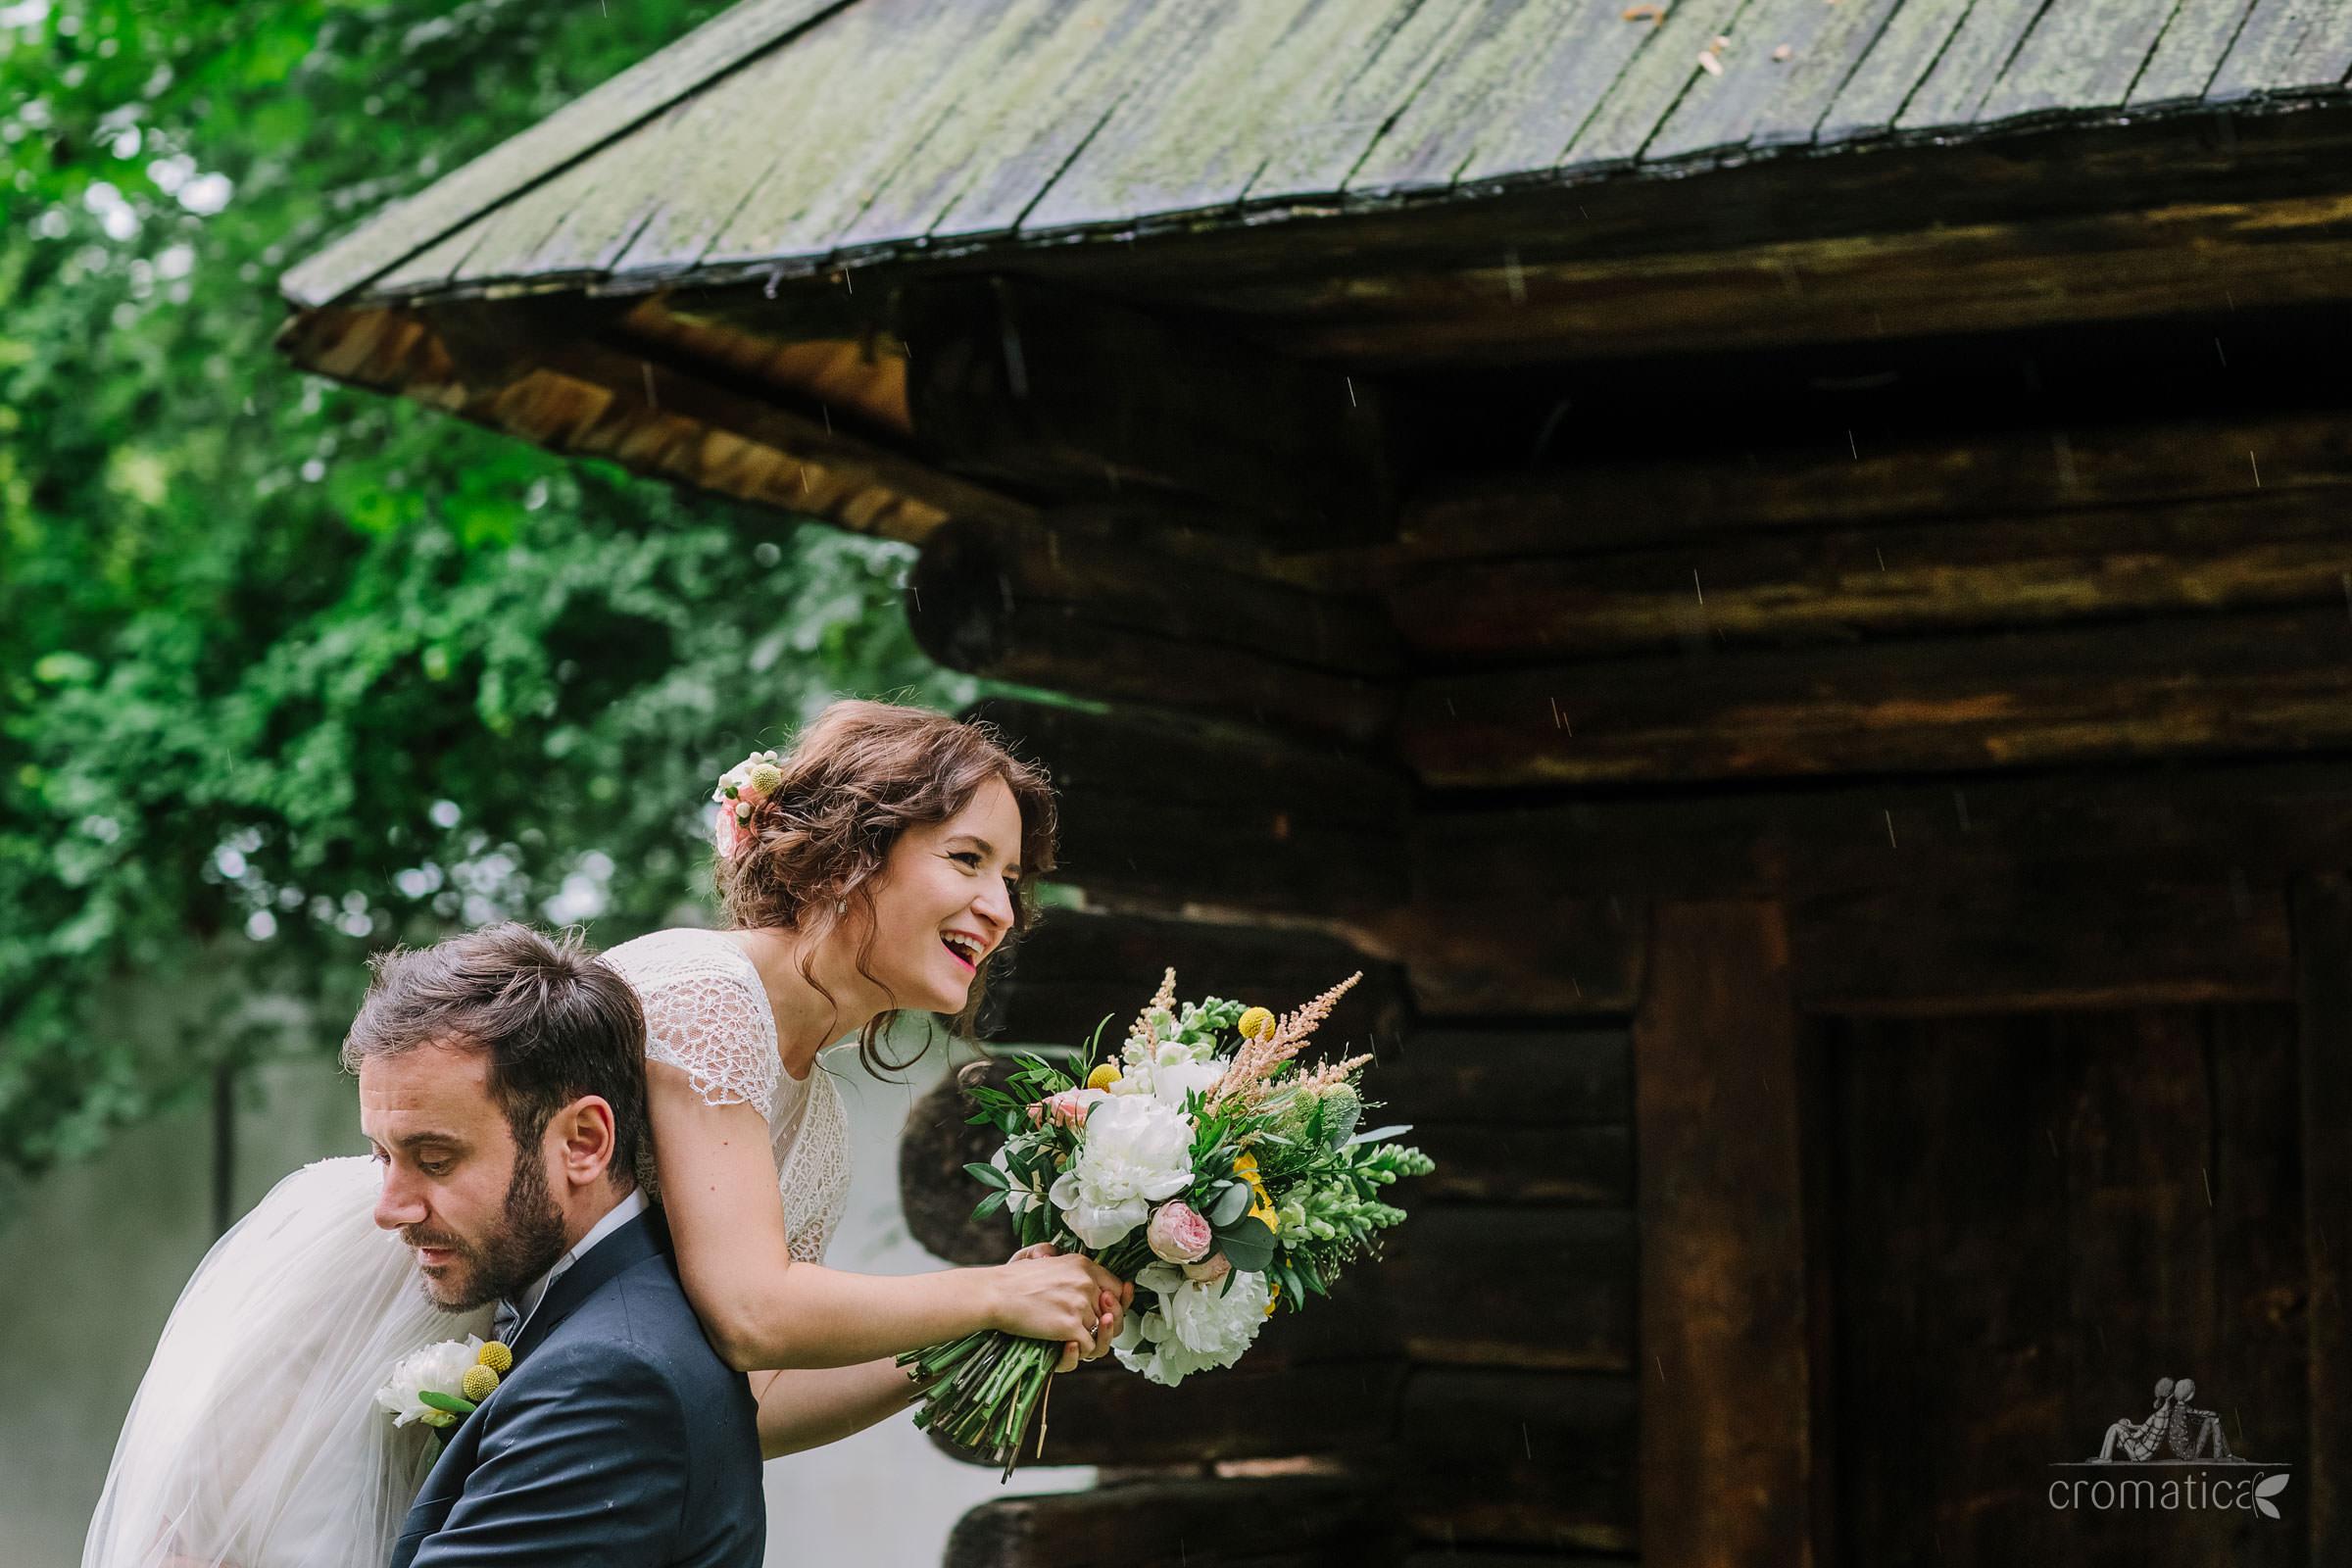 roxana mihai fotografii nunta la seratta 045